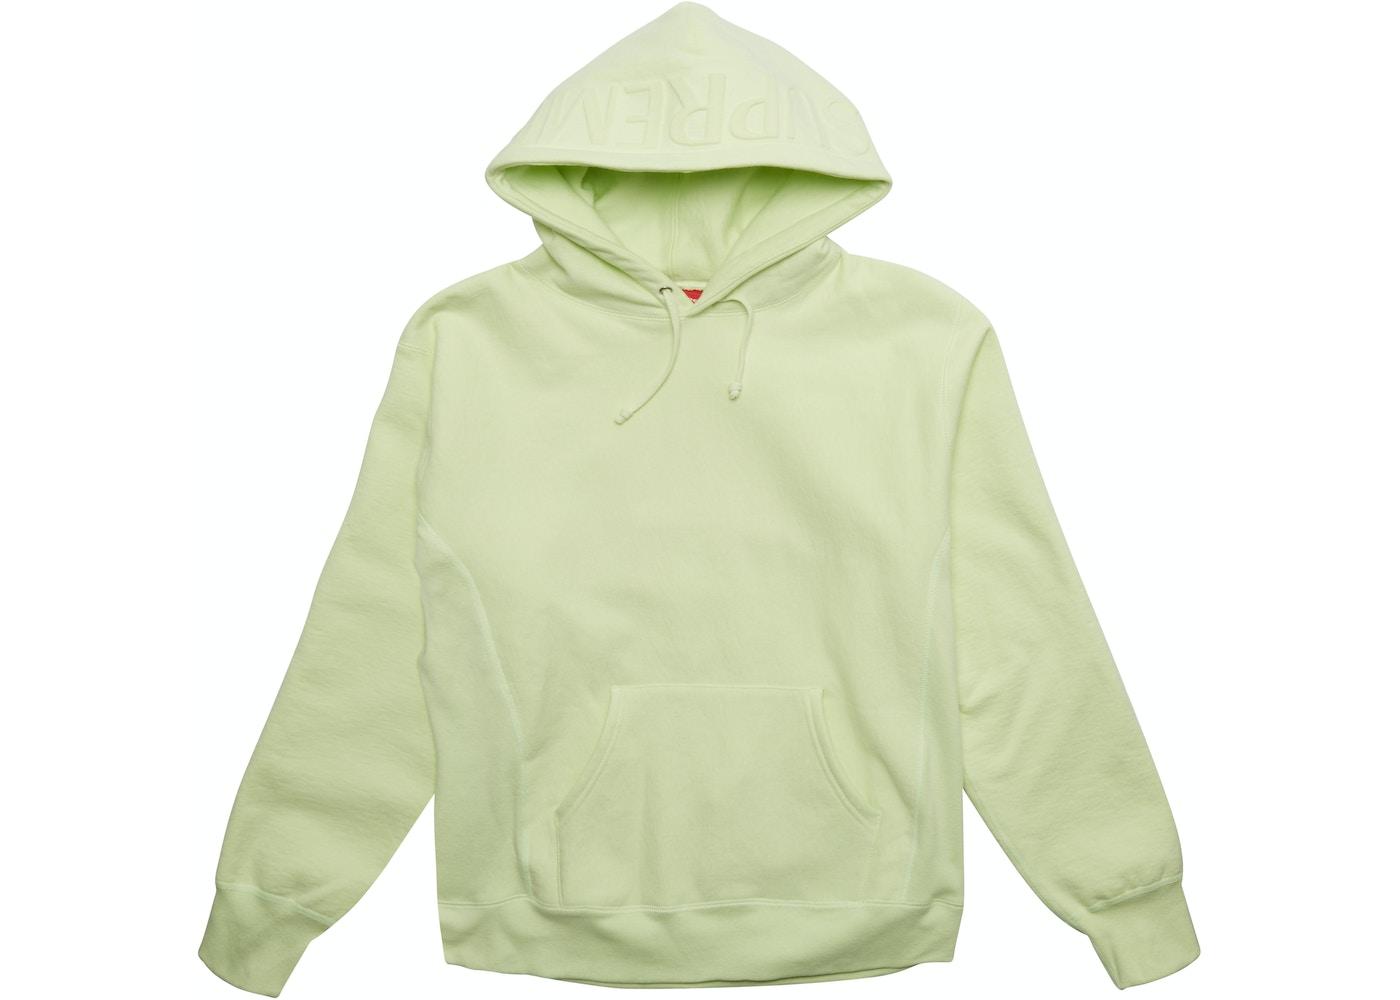 bb967fcb082f Supreme Embossed Logo Hooded Sweatshirt Pale Lime - FW17